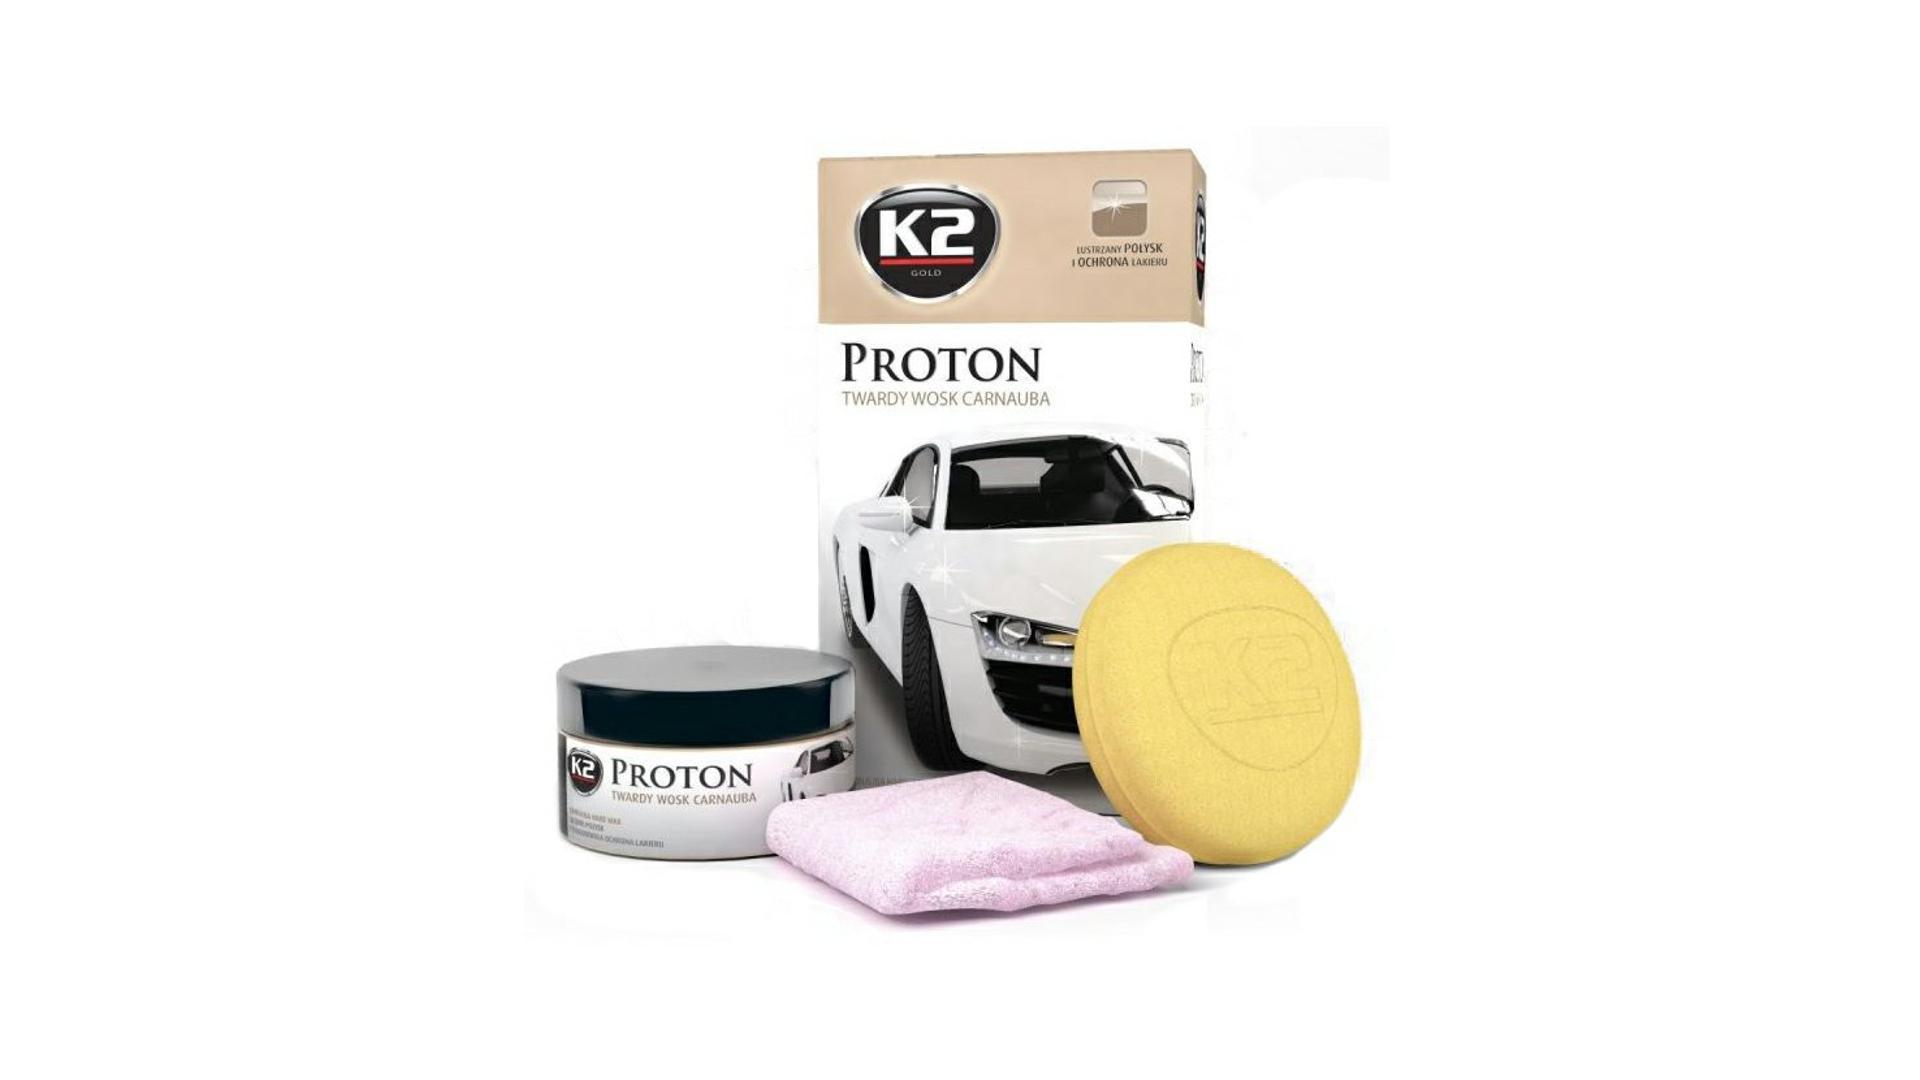 K2 PROTON 200g - tvrdý vosk karnauba